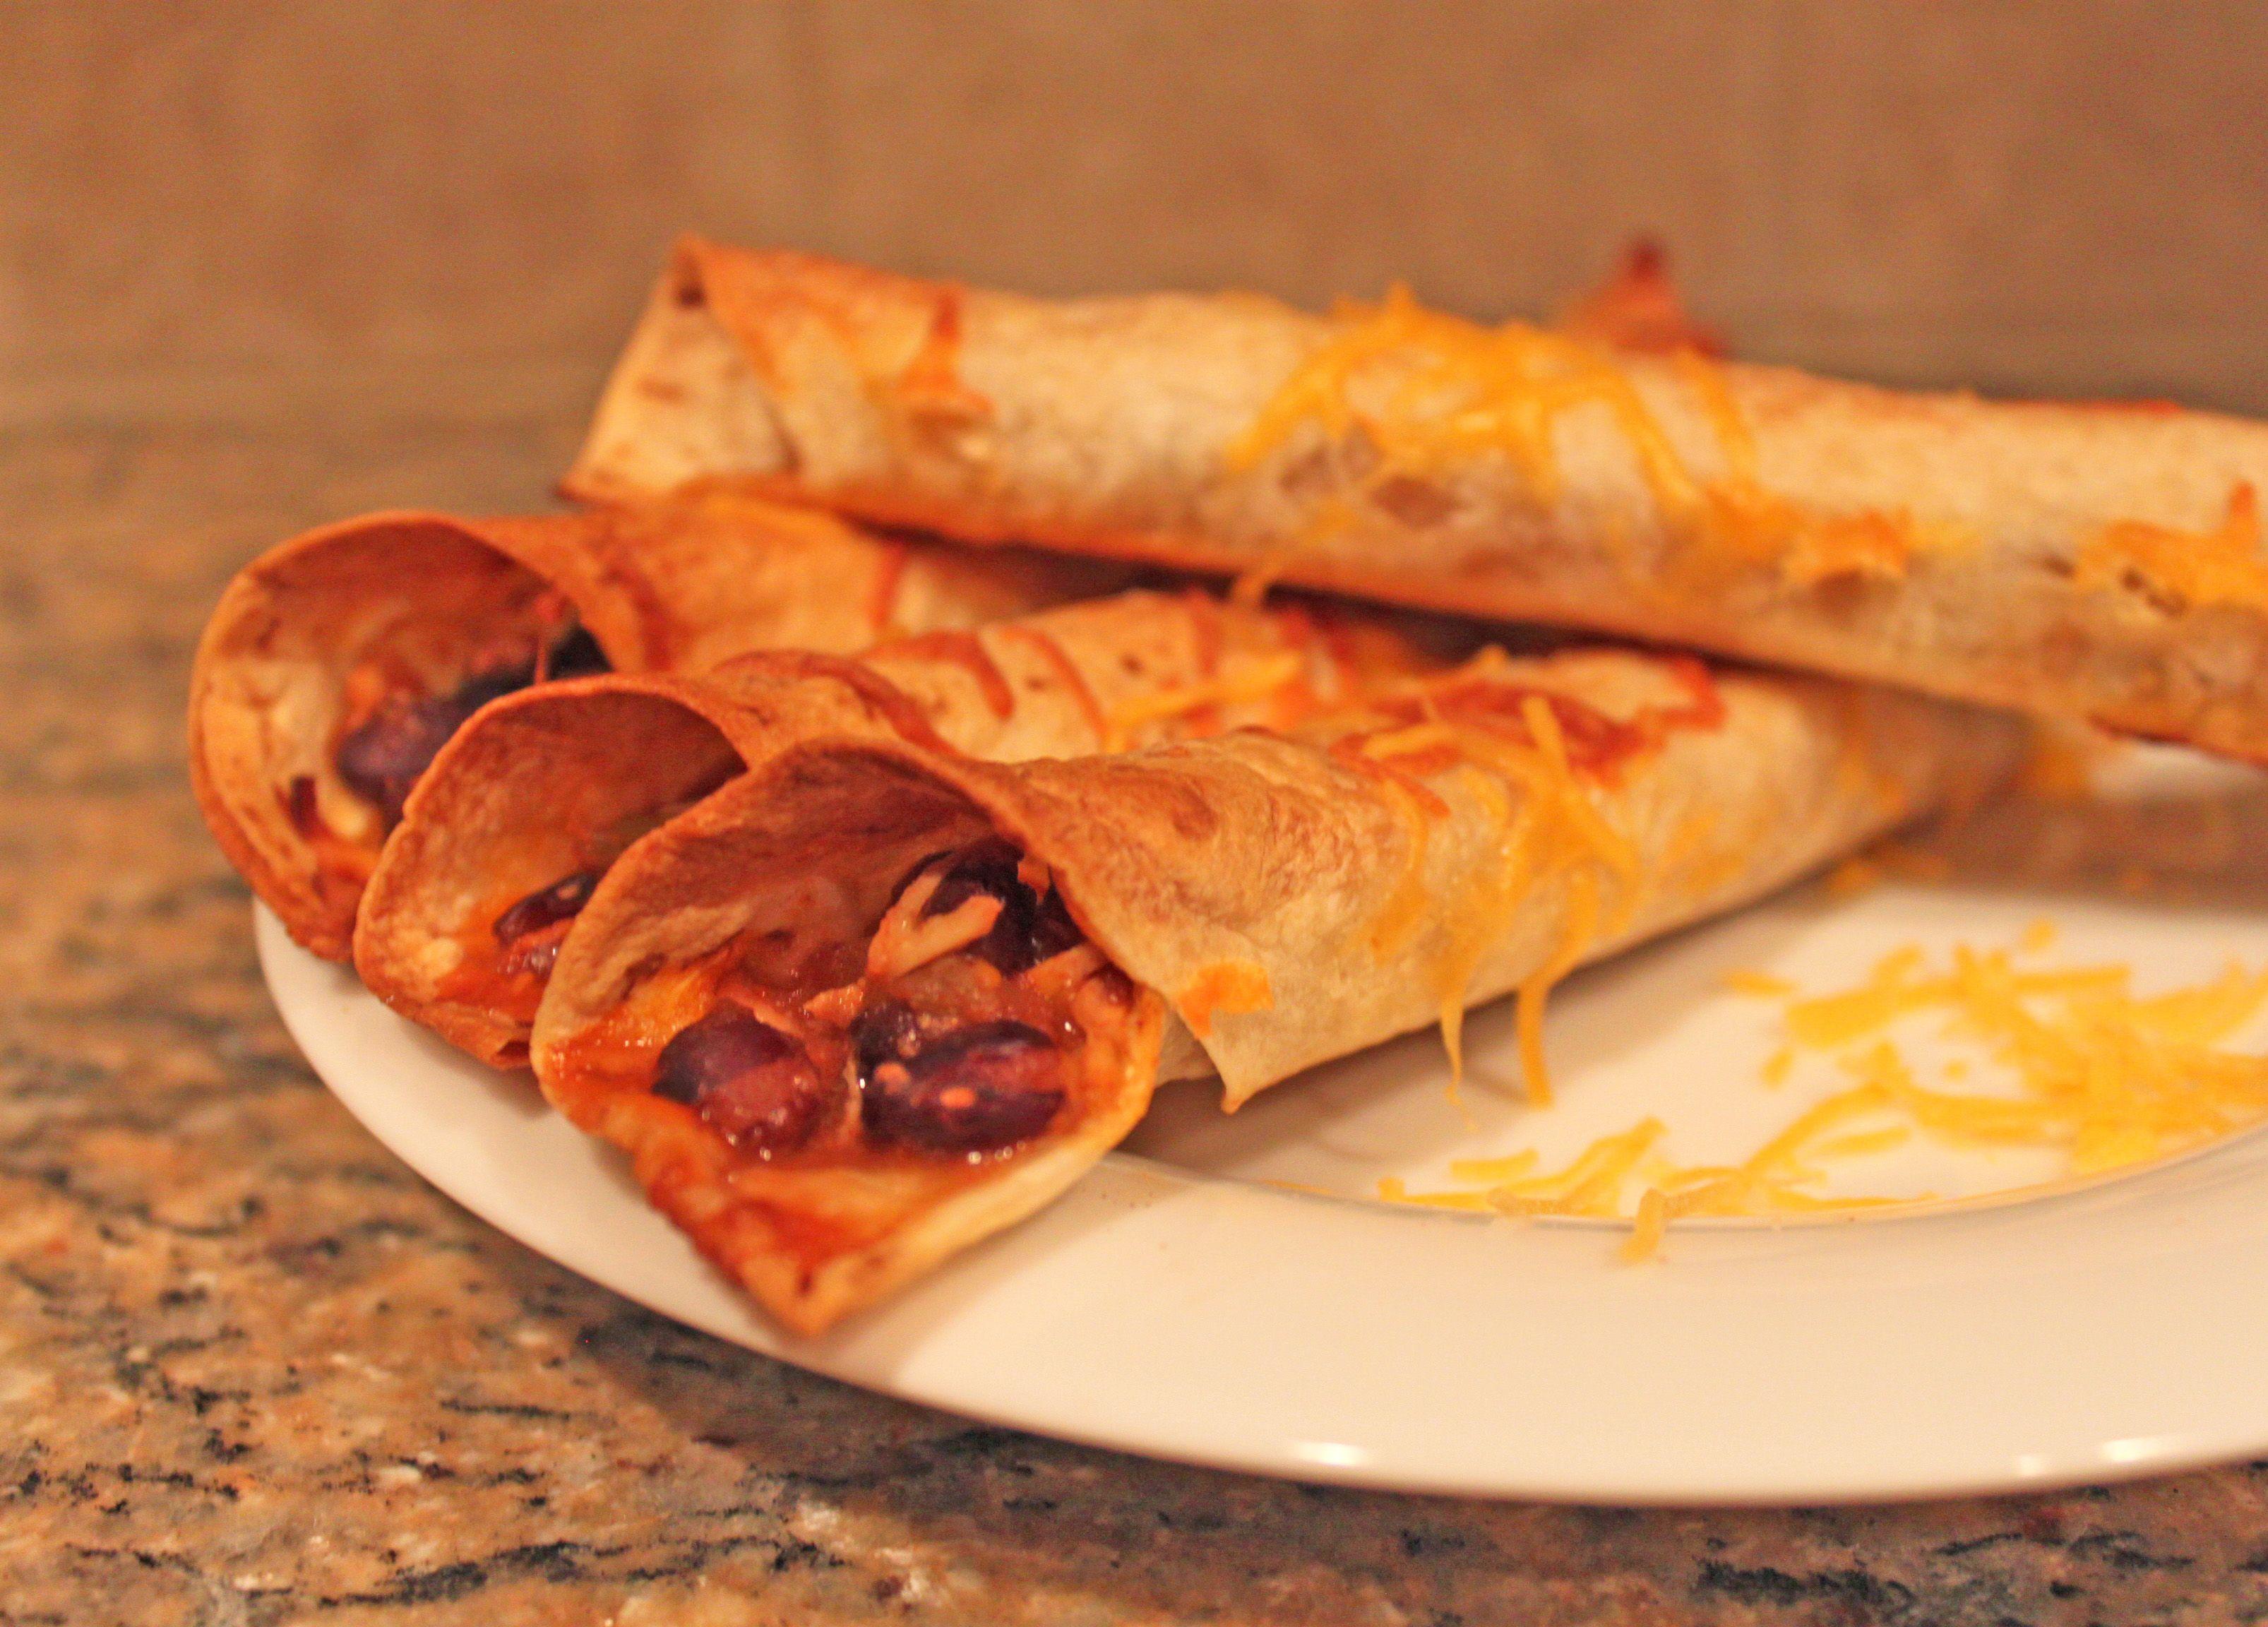 Semi-Slow Cooker Black Bean & Chicken Baked Taquitos | Little Kitchen, Big Bites